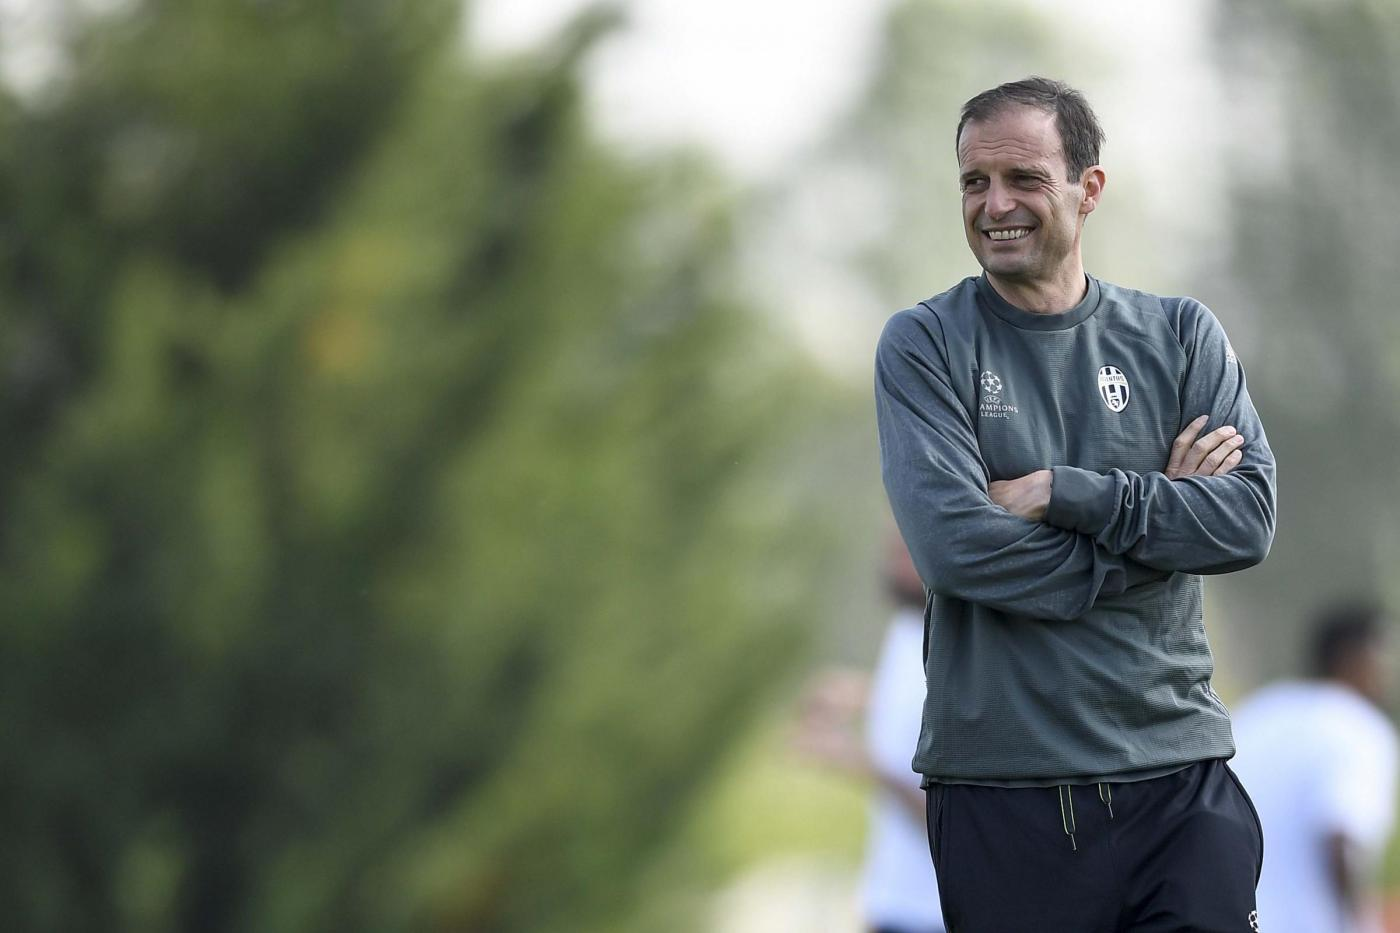 Barcellona - Juventus 0 a 0 Champions League, i bianconeri passano in semifinale